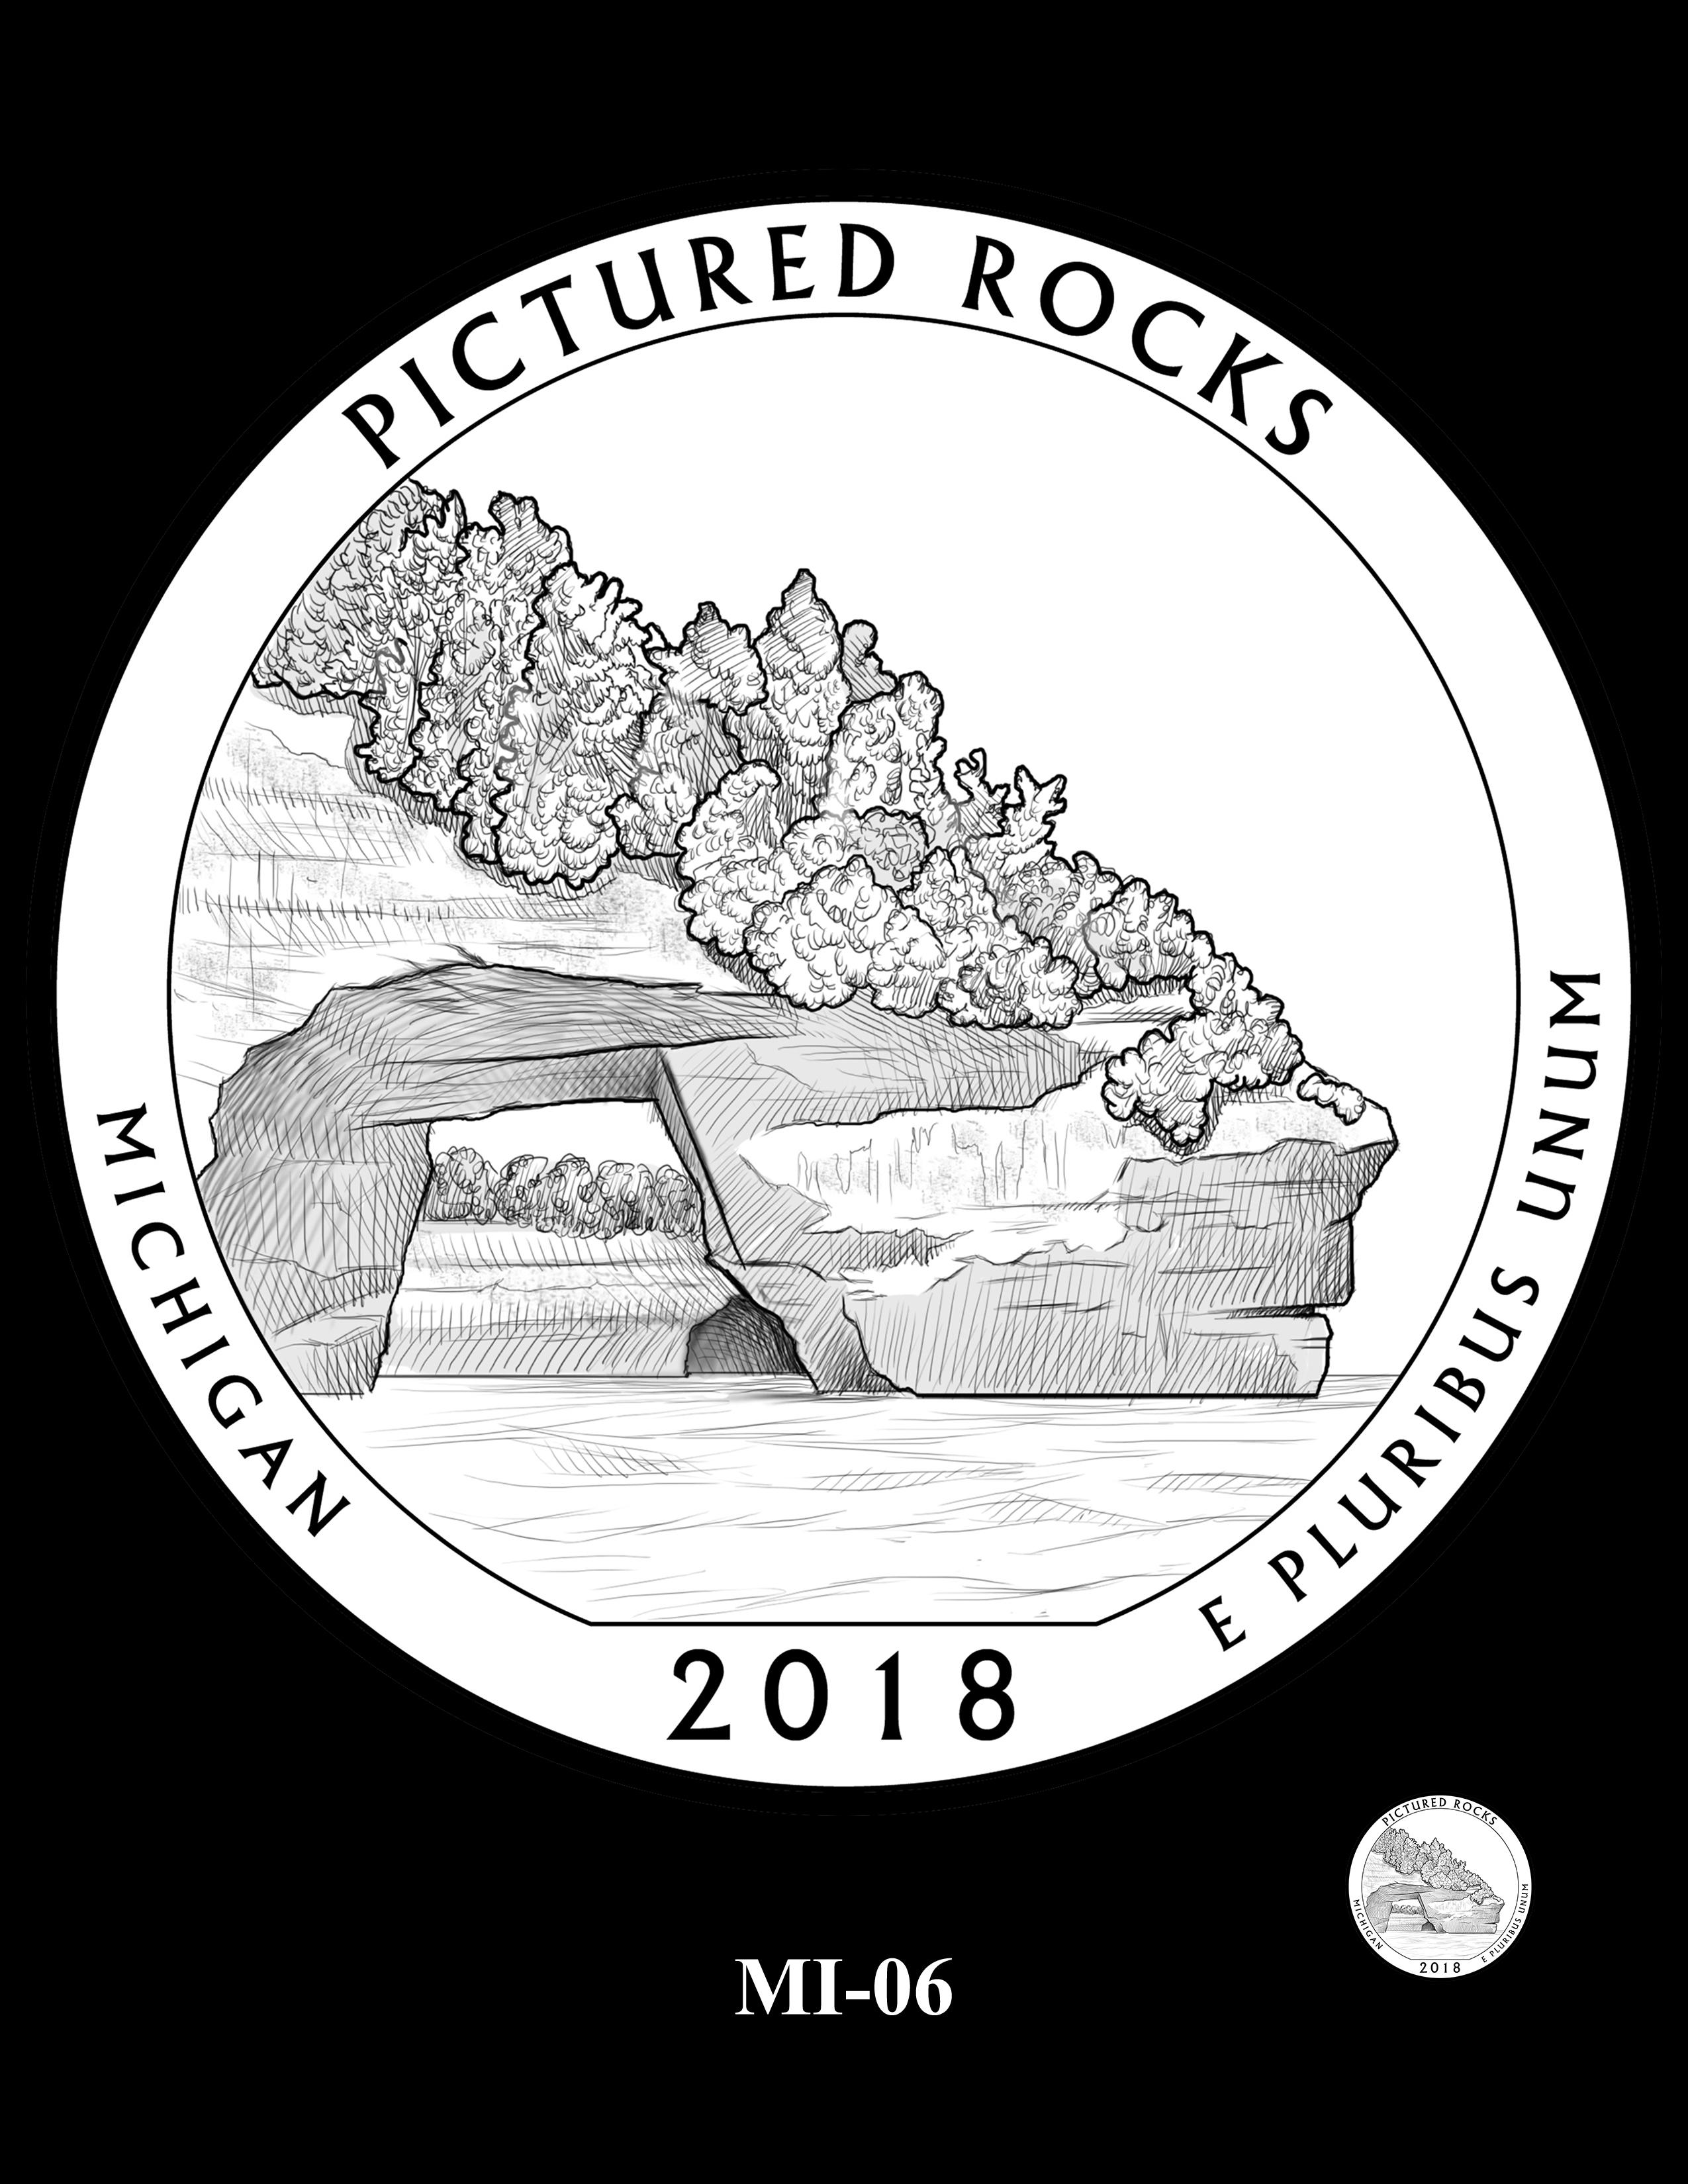 MI-06 -- 2018 America the Beautiful® Quarters Program